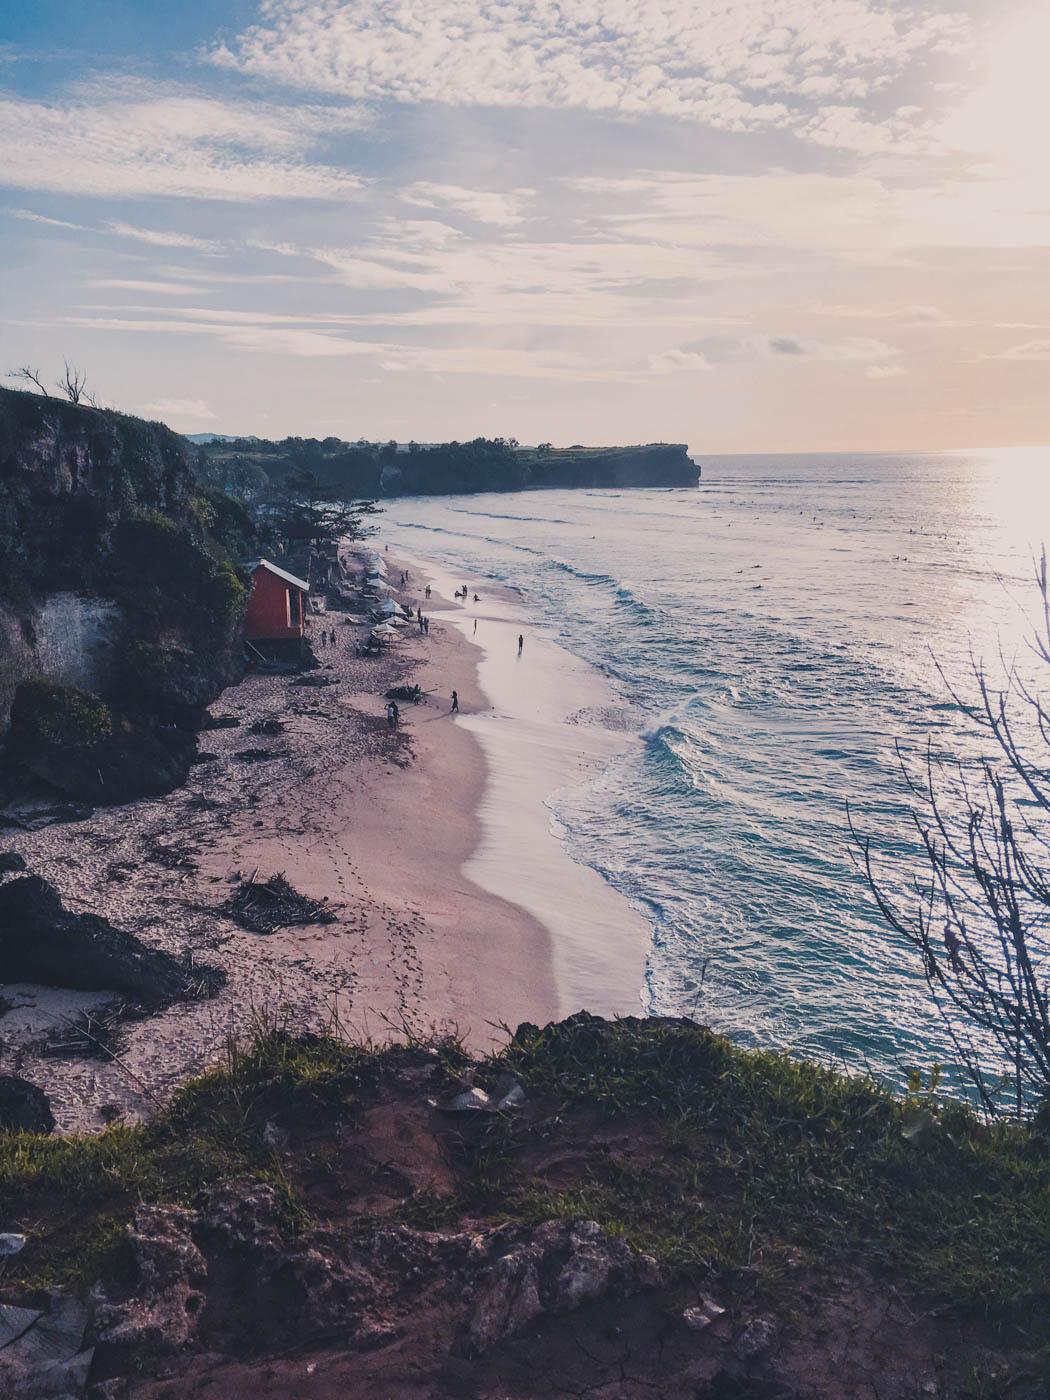 Balangan Beach - Bali Itinerary #traveldestinations #bali #beautifulplaces